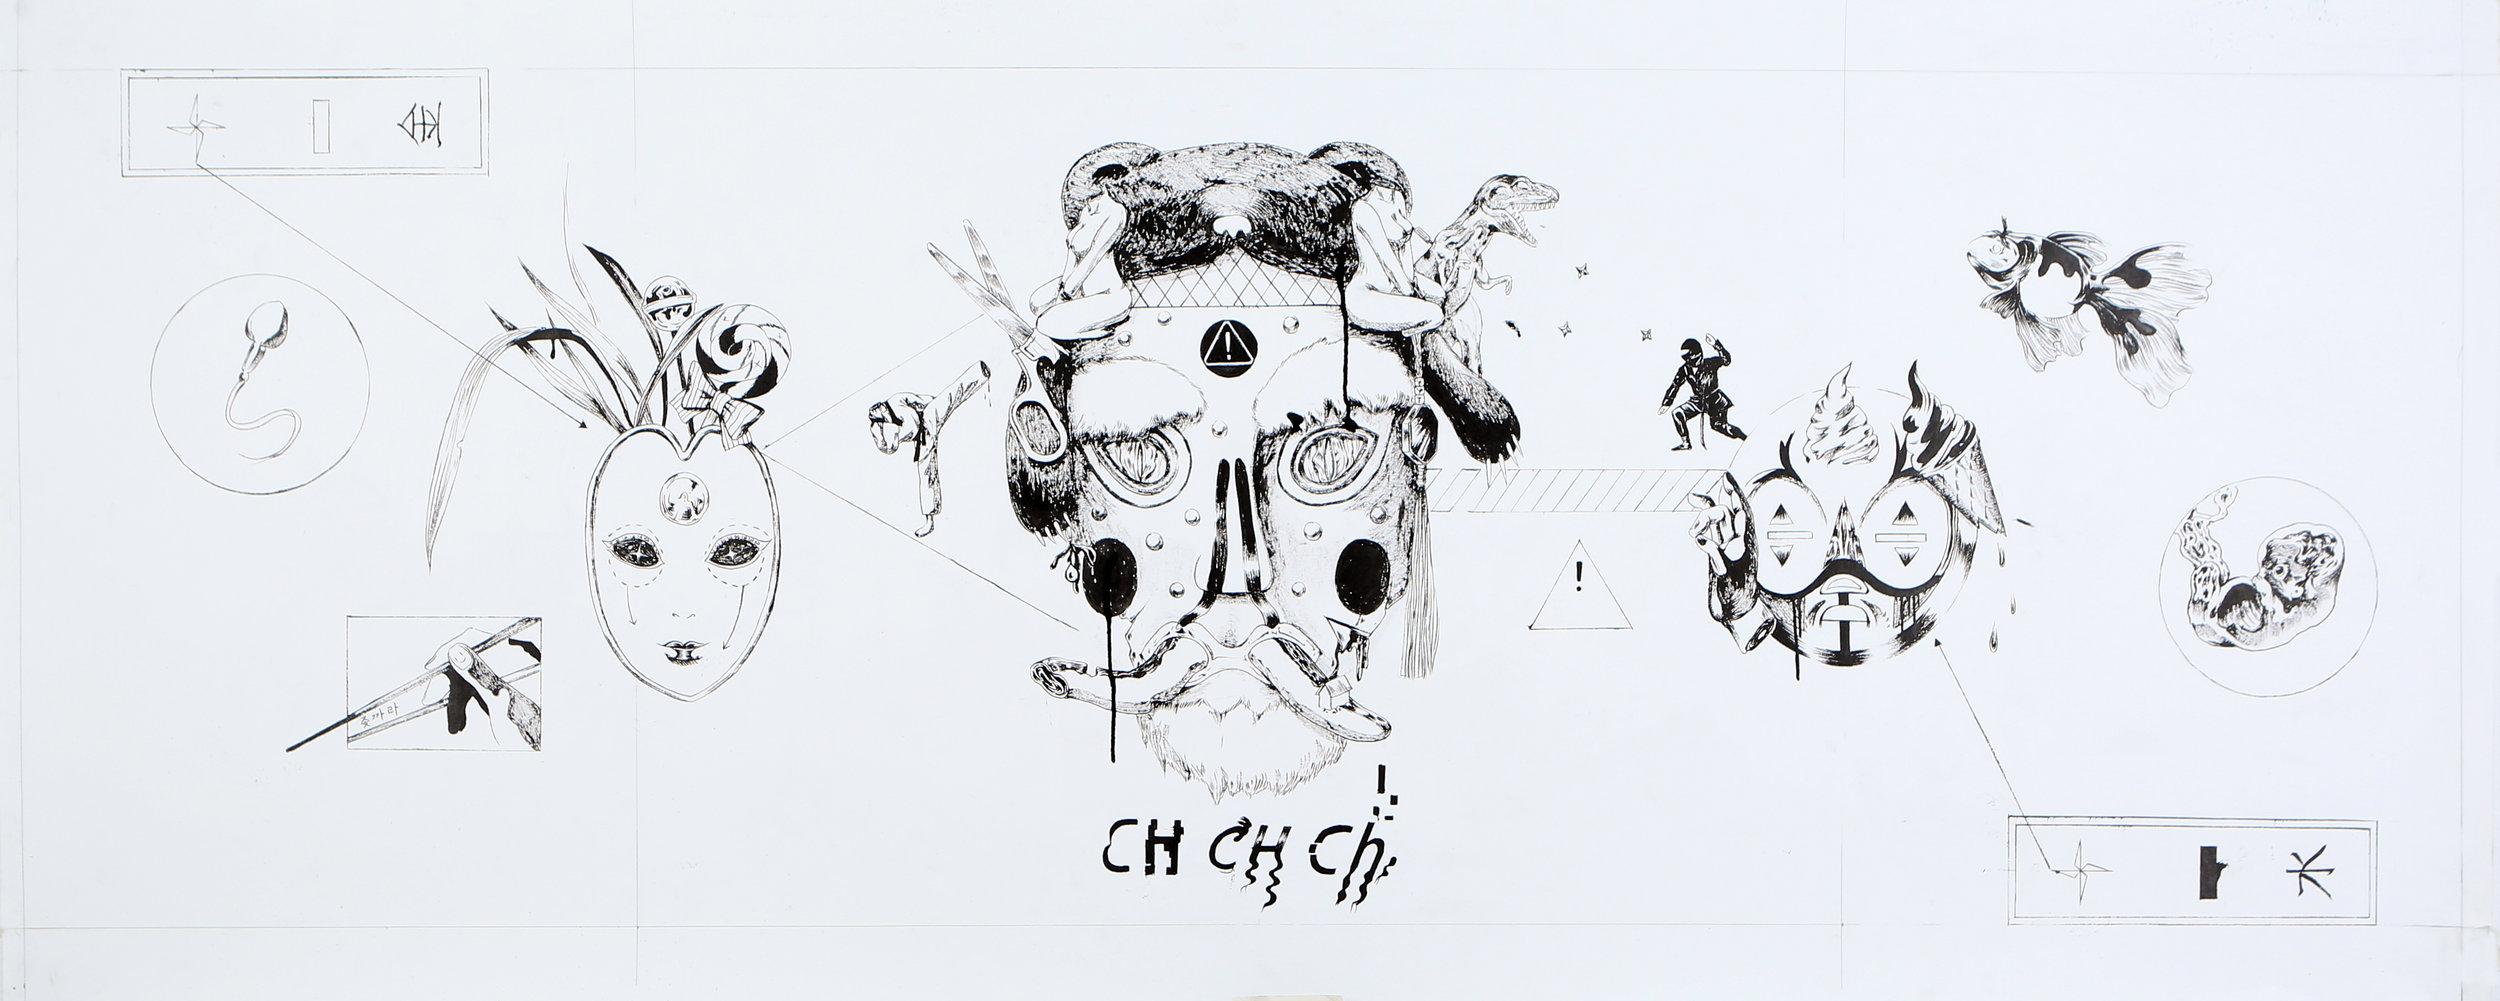 CH CH Ch,2018 Black ink on paper 62.5x154cm